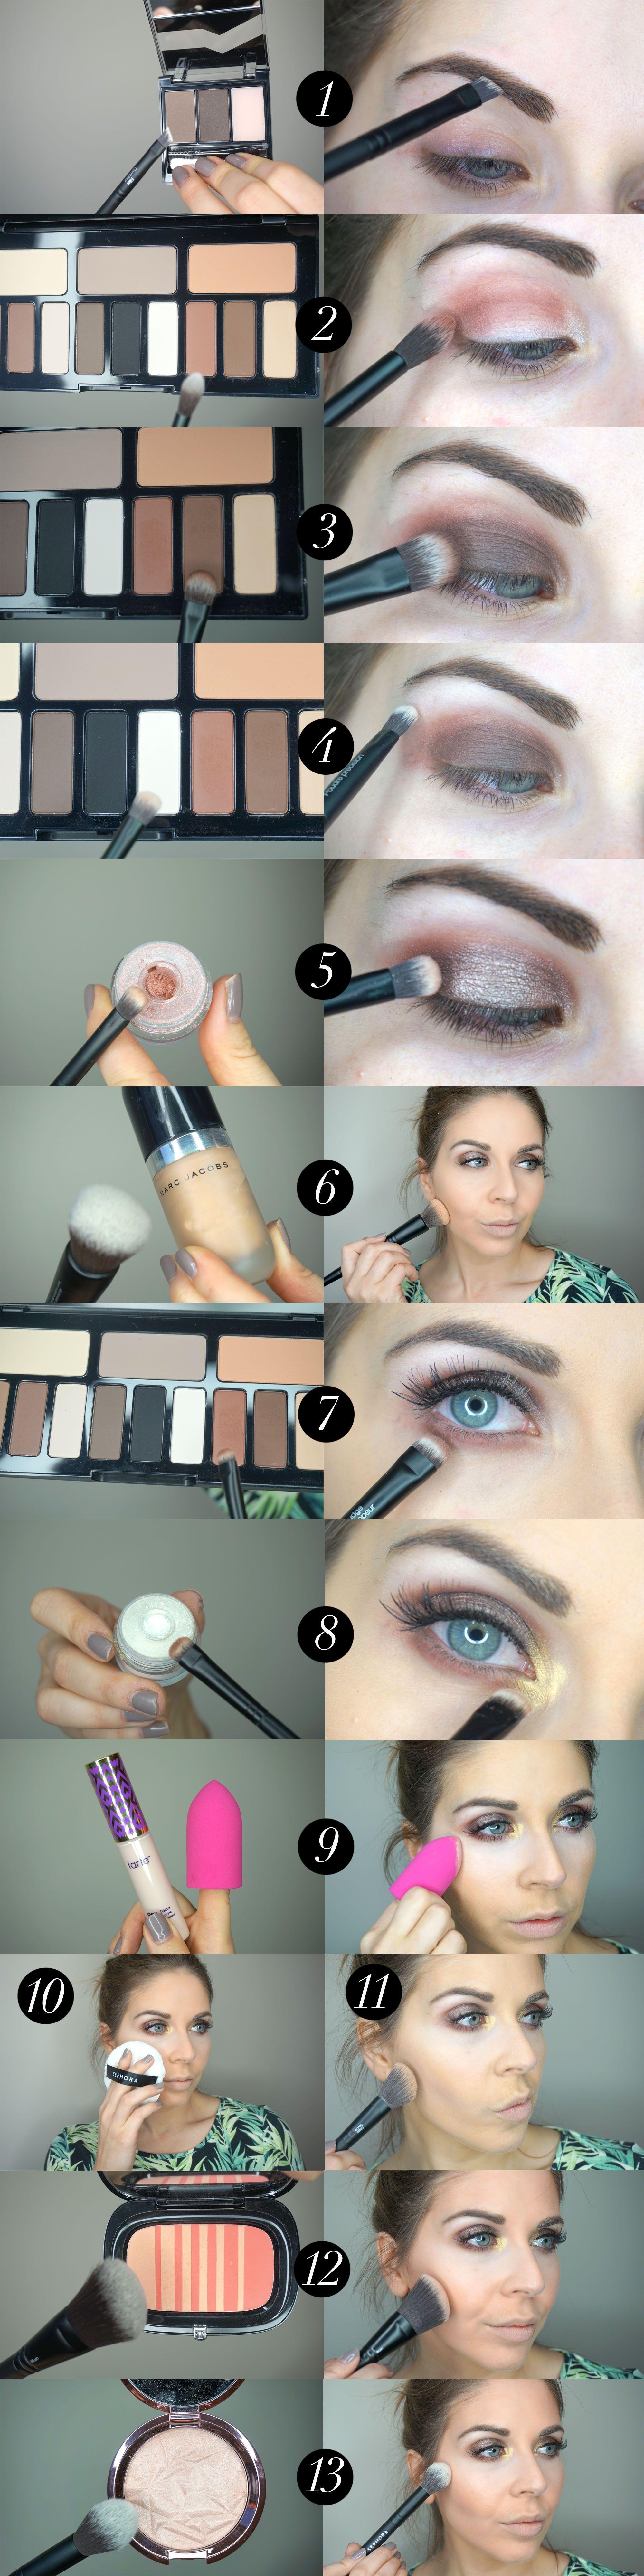 Brown smokey eye makeup tutorial featuring Sephora Collection doubleended brushes and Kat Von D Shade  Light Eye Contour palette brownsmokeyeyemakeuptutorial